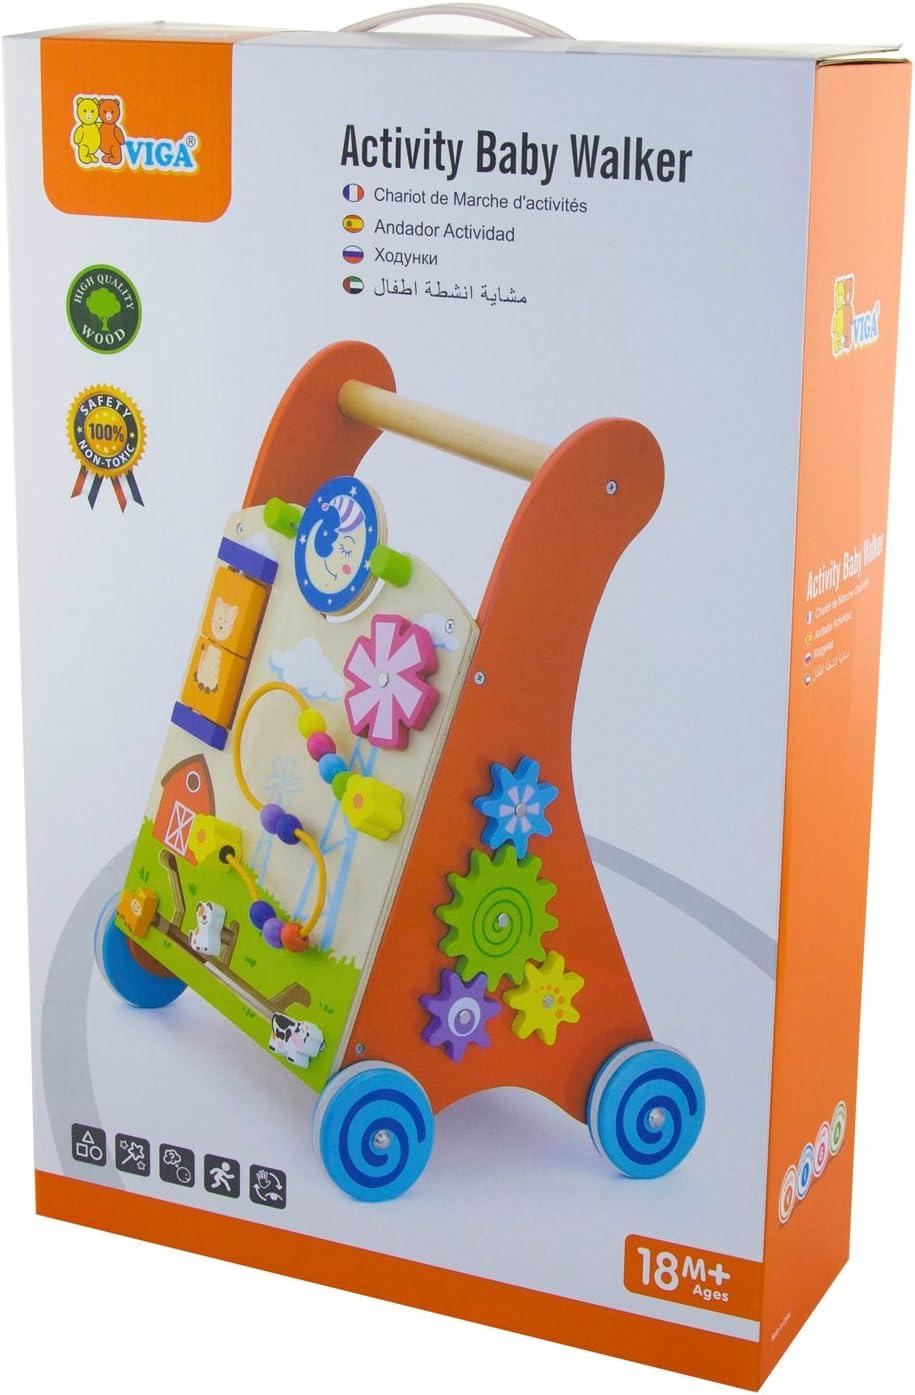 Amazon.com: VIGA Toys - 50950 - Activity Baby Walker - Red ...